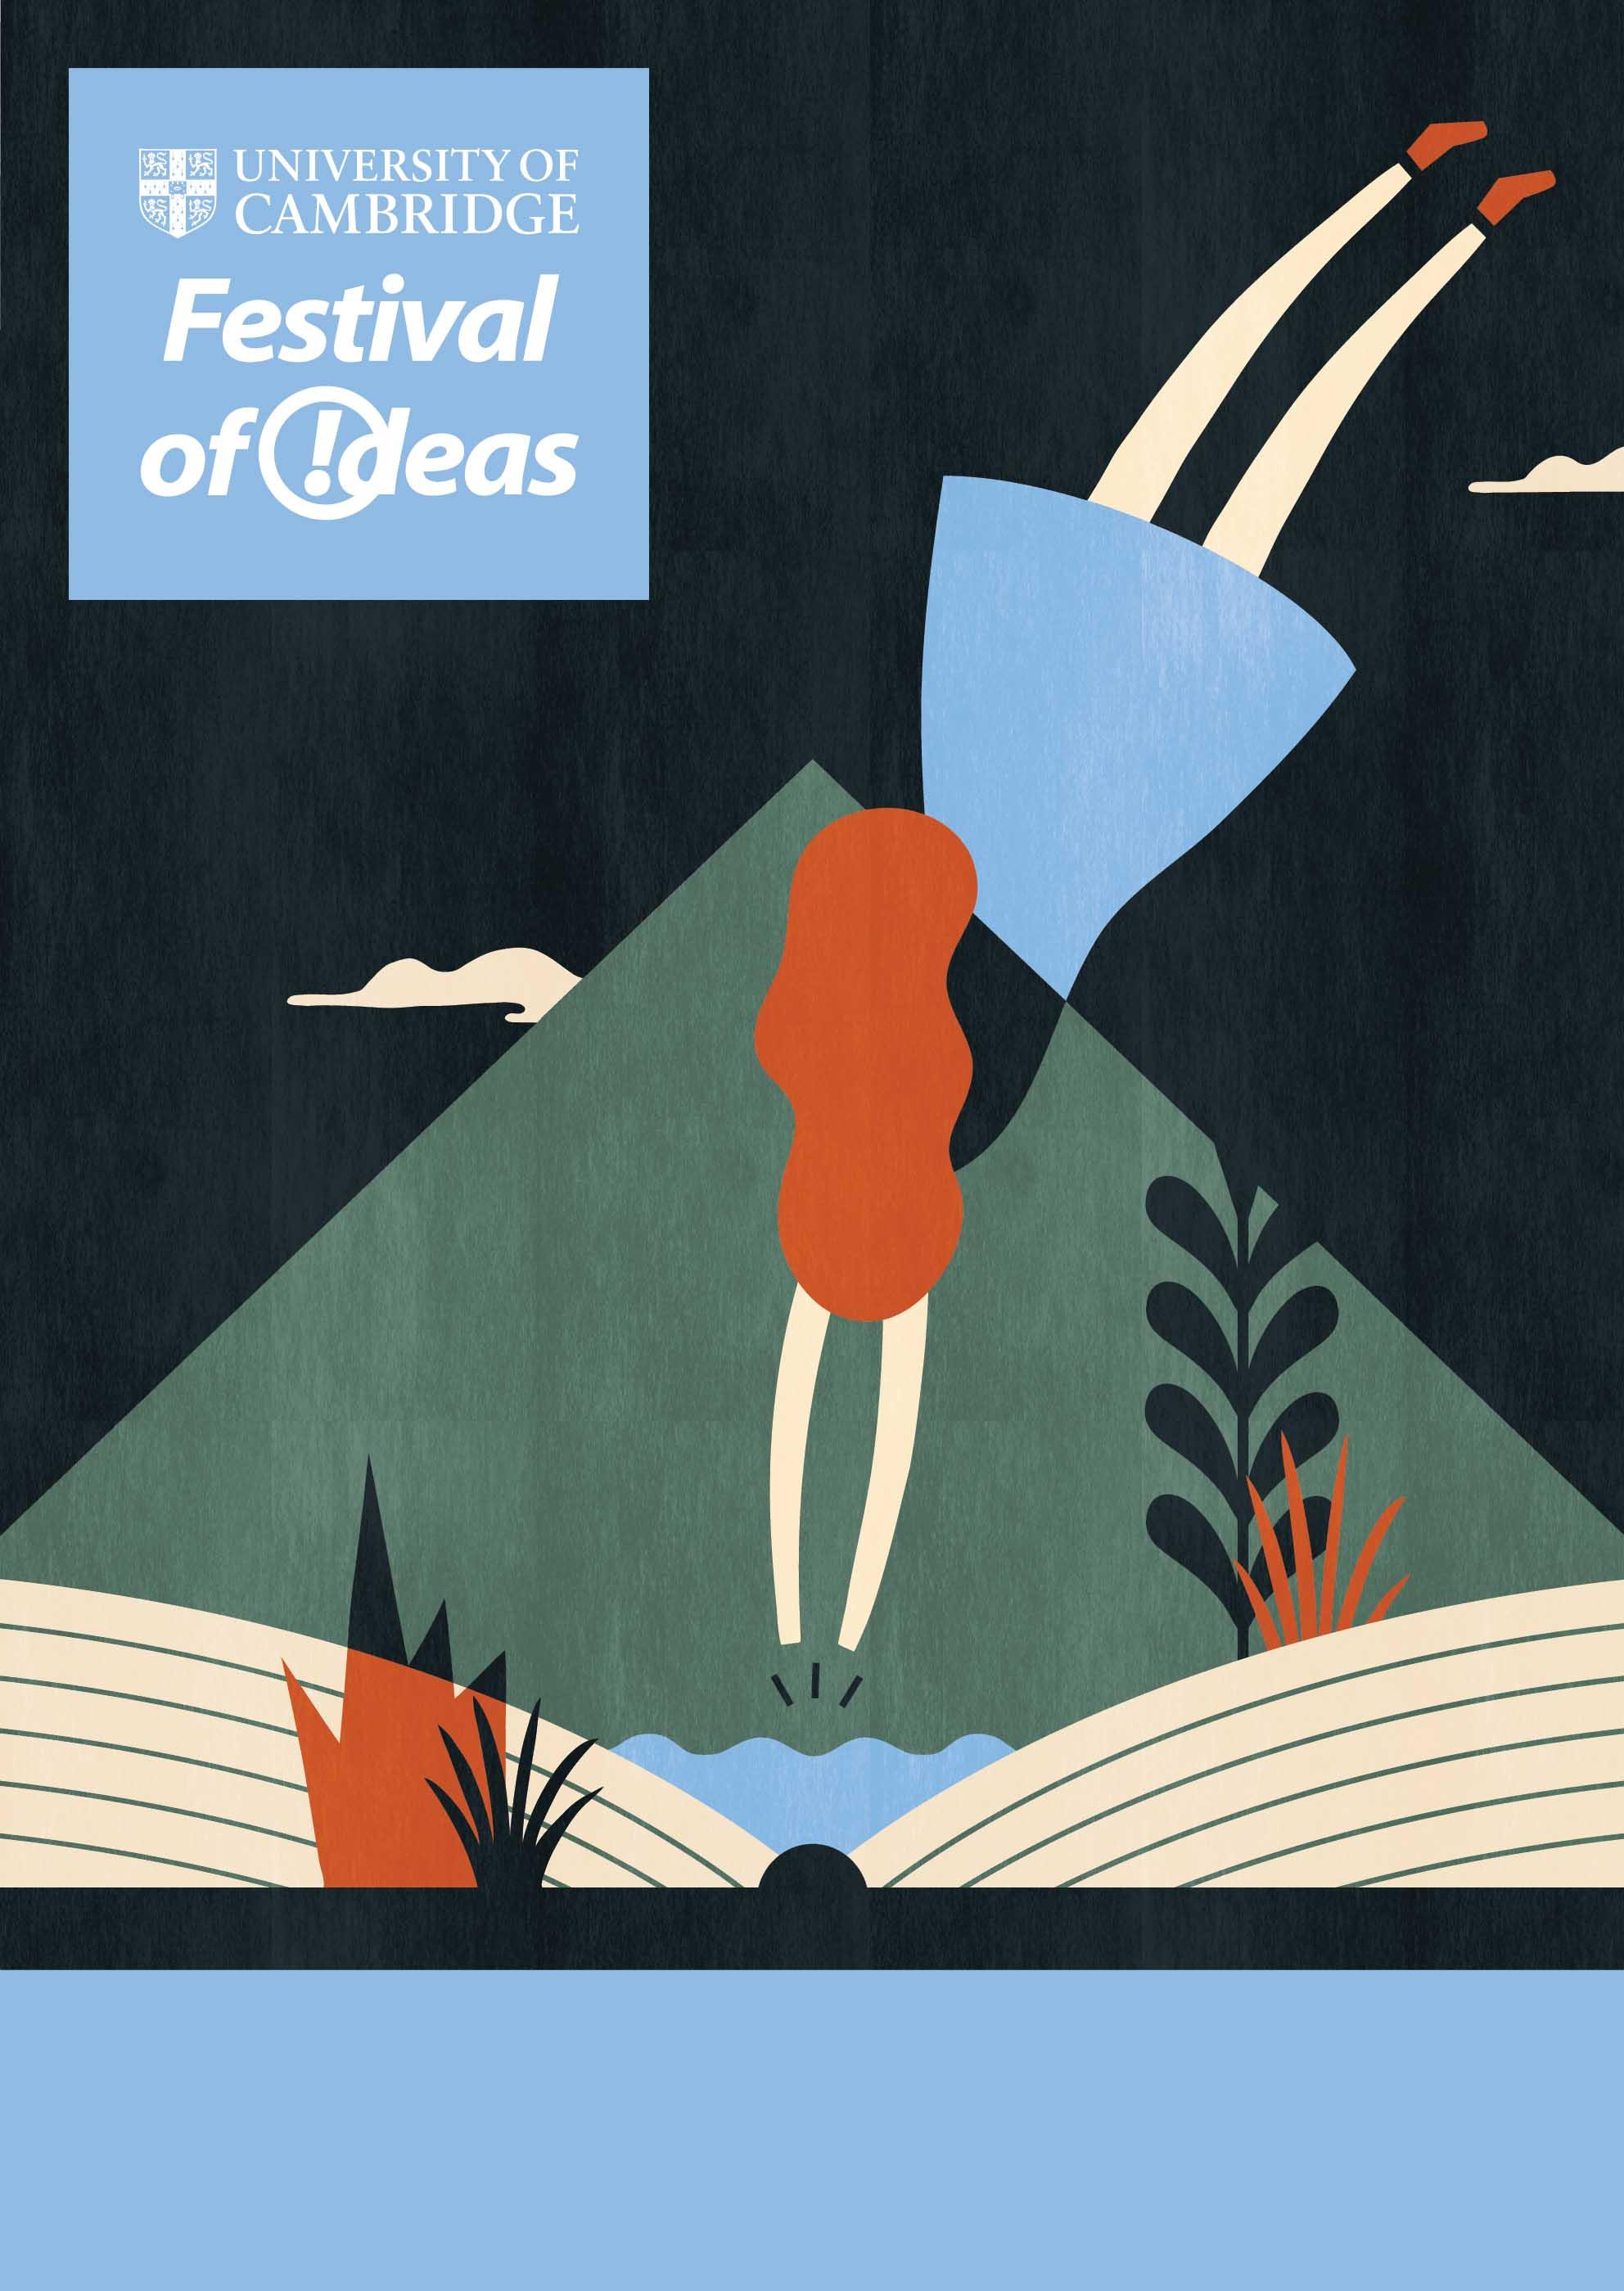 hannahalice-illustration-festivalofideas-abstract-cambridgeuniversity-cover.jpg